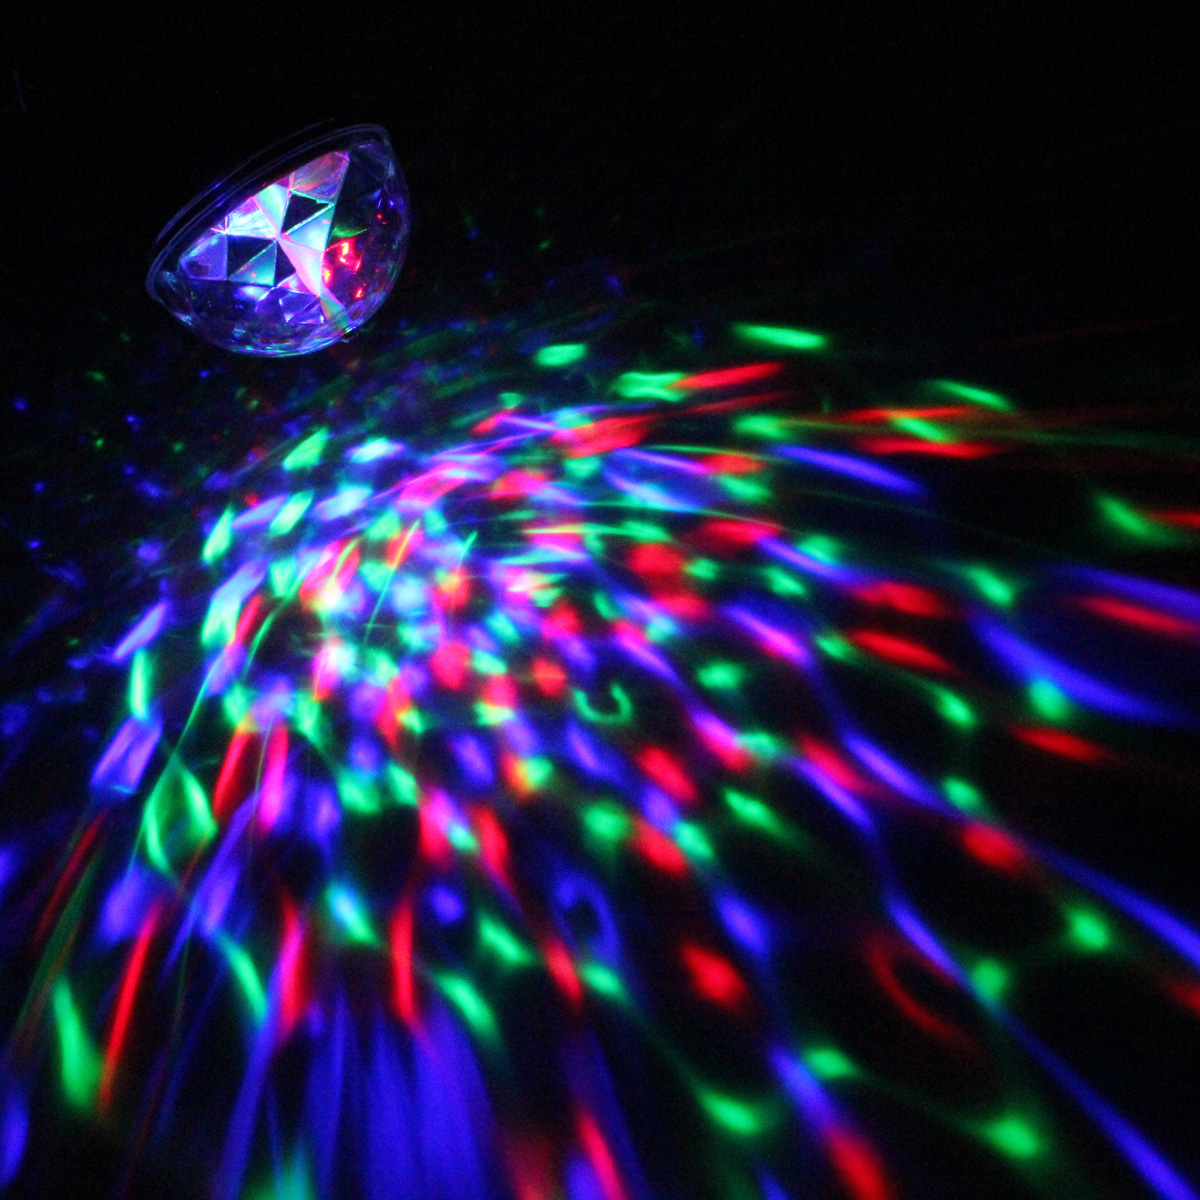 u 3w mini projecteur rgb led lumi re spot boule cristal lampe eclairage dj disco eu prise eu. Black Bedroom Furniture Sets. Home Design Ideas